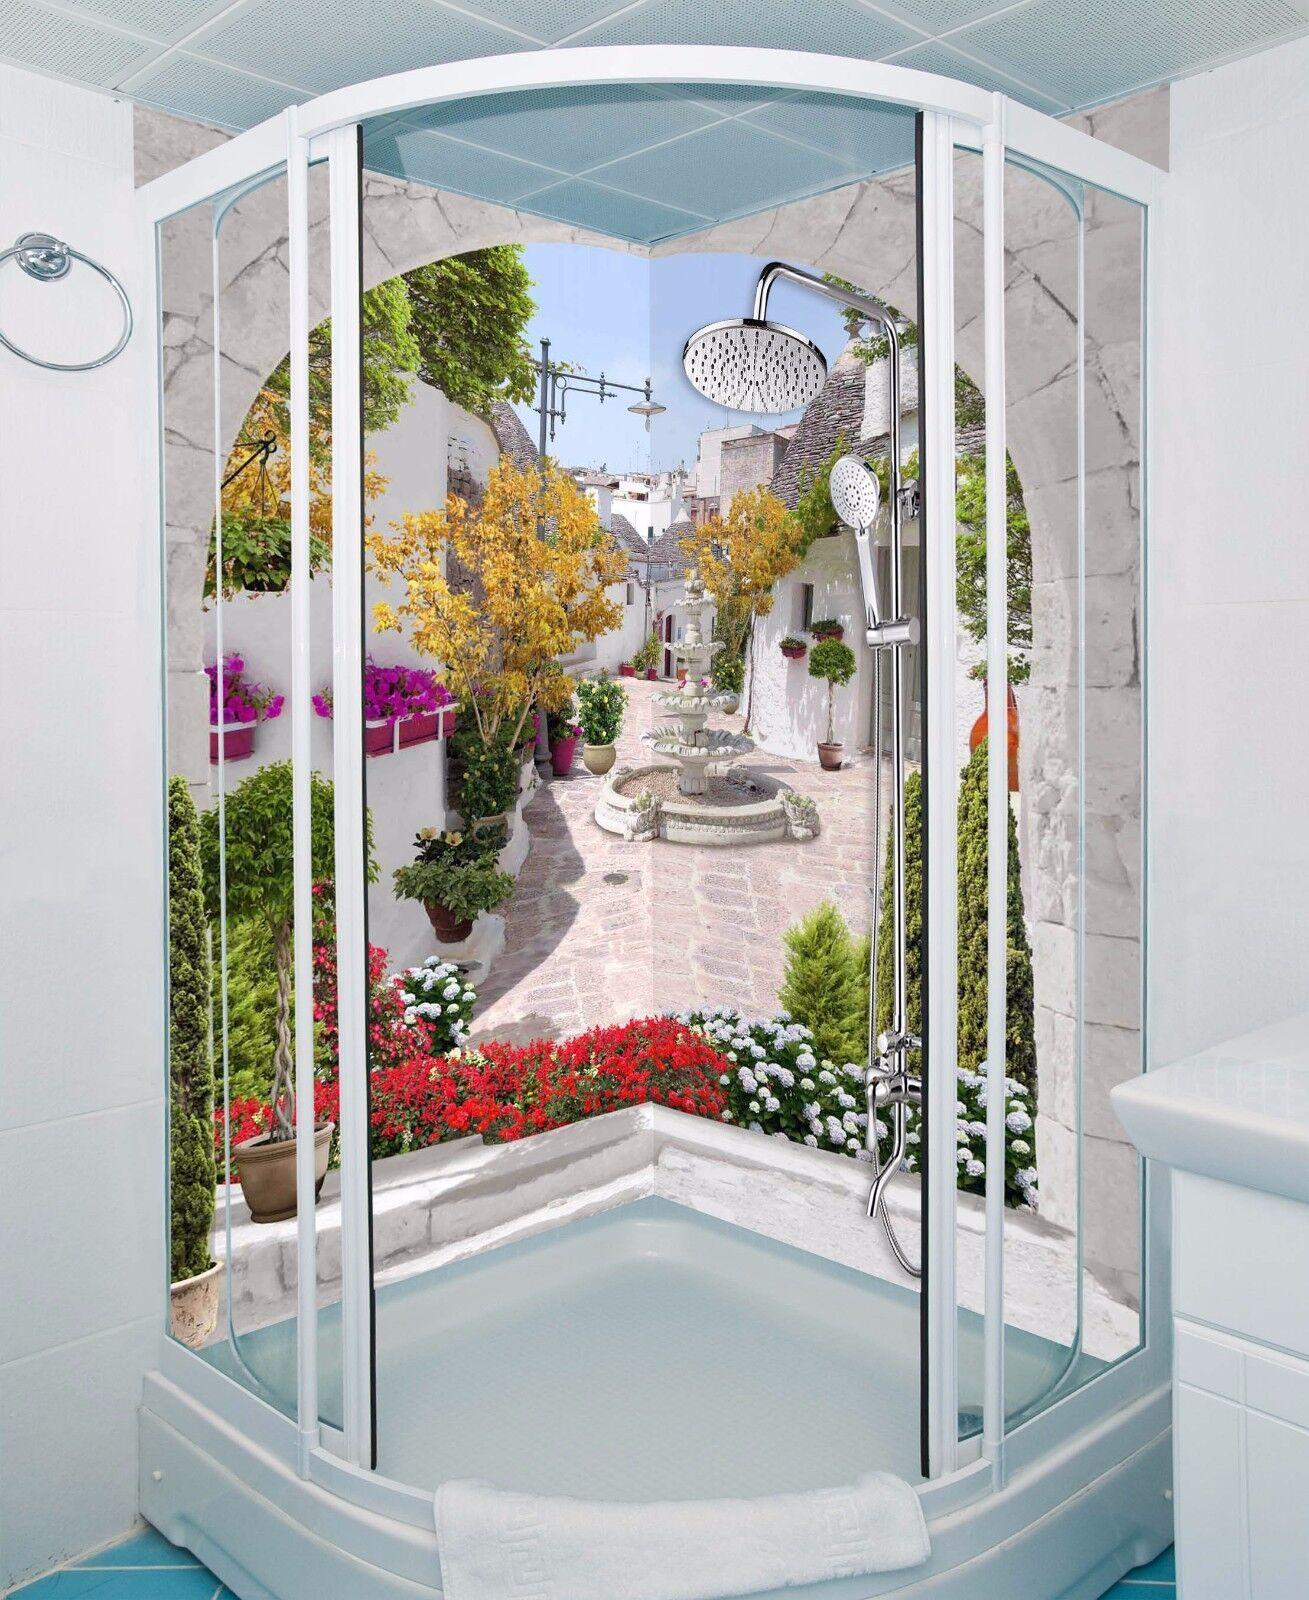 3D Arch Street WallPaper Bathroom Print Decal Wall Deco AJ WALLPAPER UK